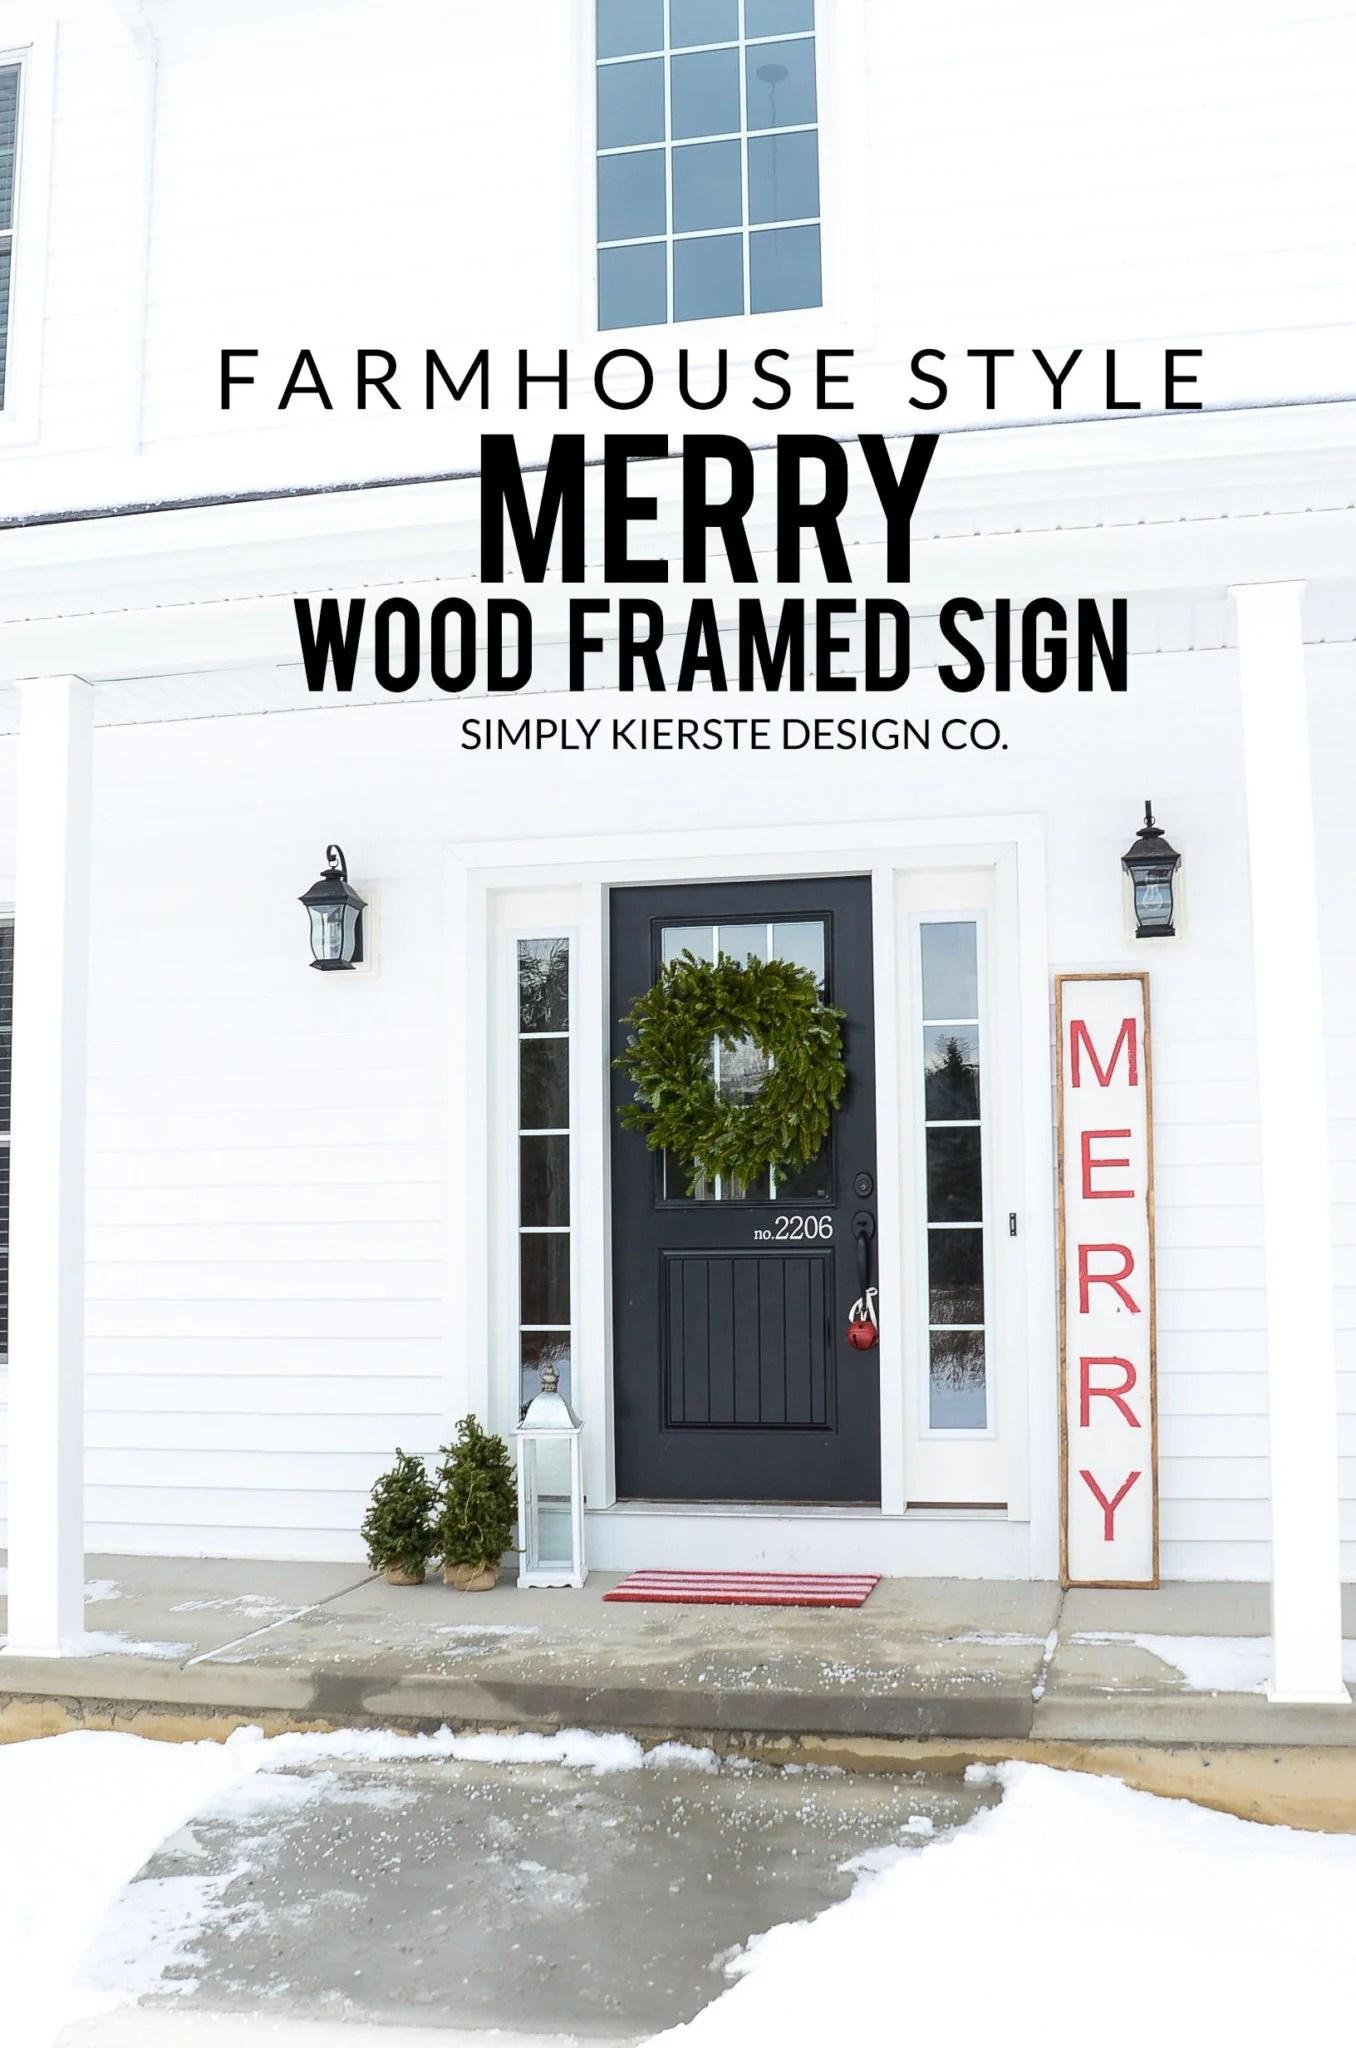 Merry Christmas Wood Sign   Farmhouse Style   oldsaltfarm.com #woodsign #diychristmasdecor #christmassign